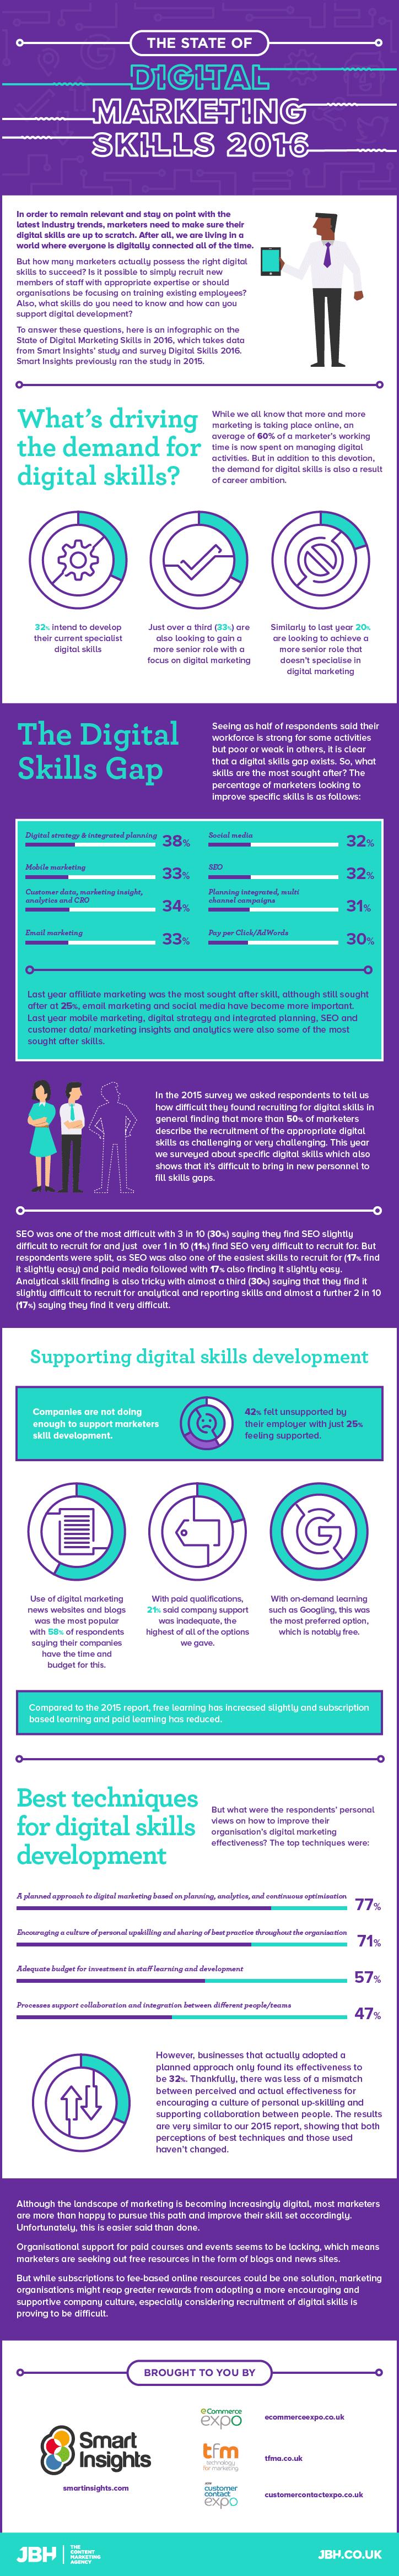 Digital Skills Infographic state of digital marketing skills 2016